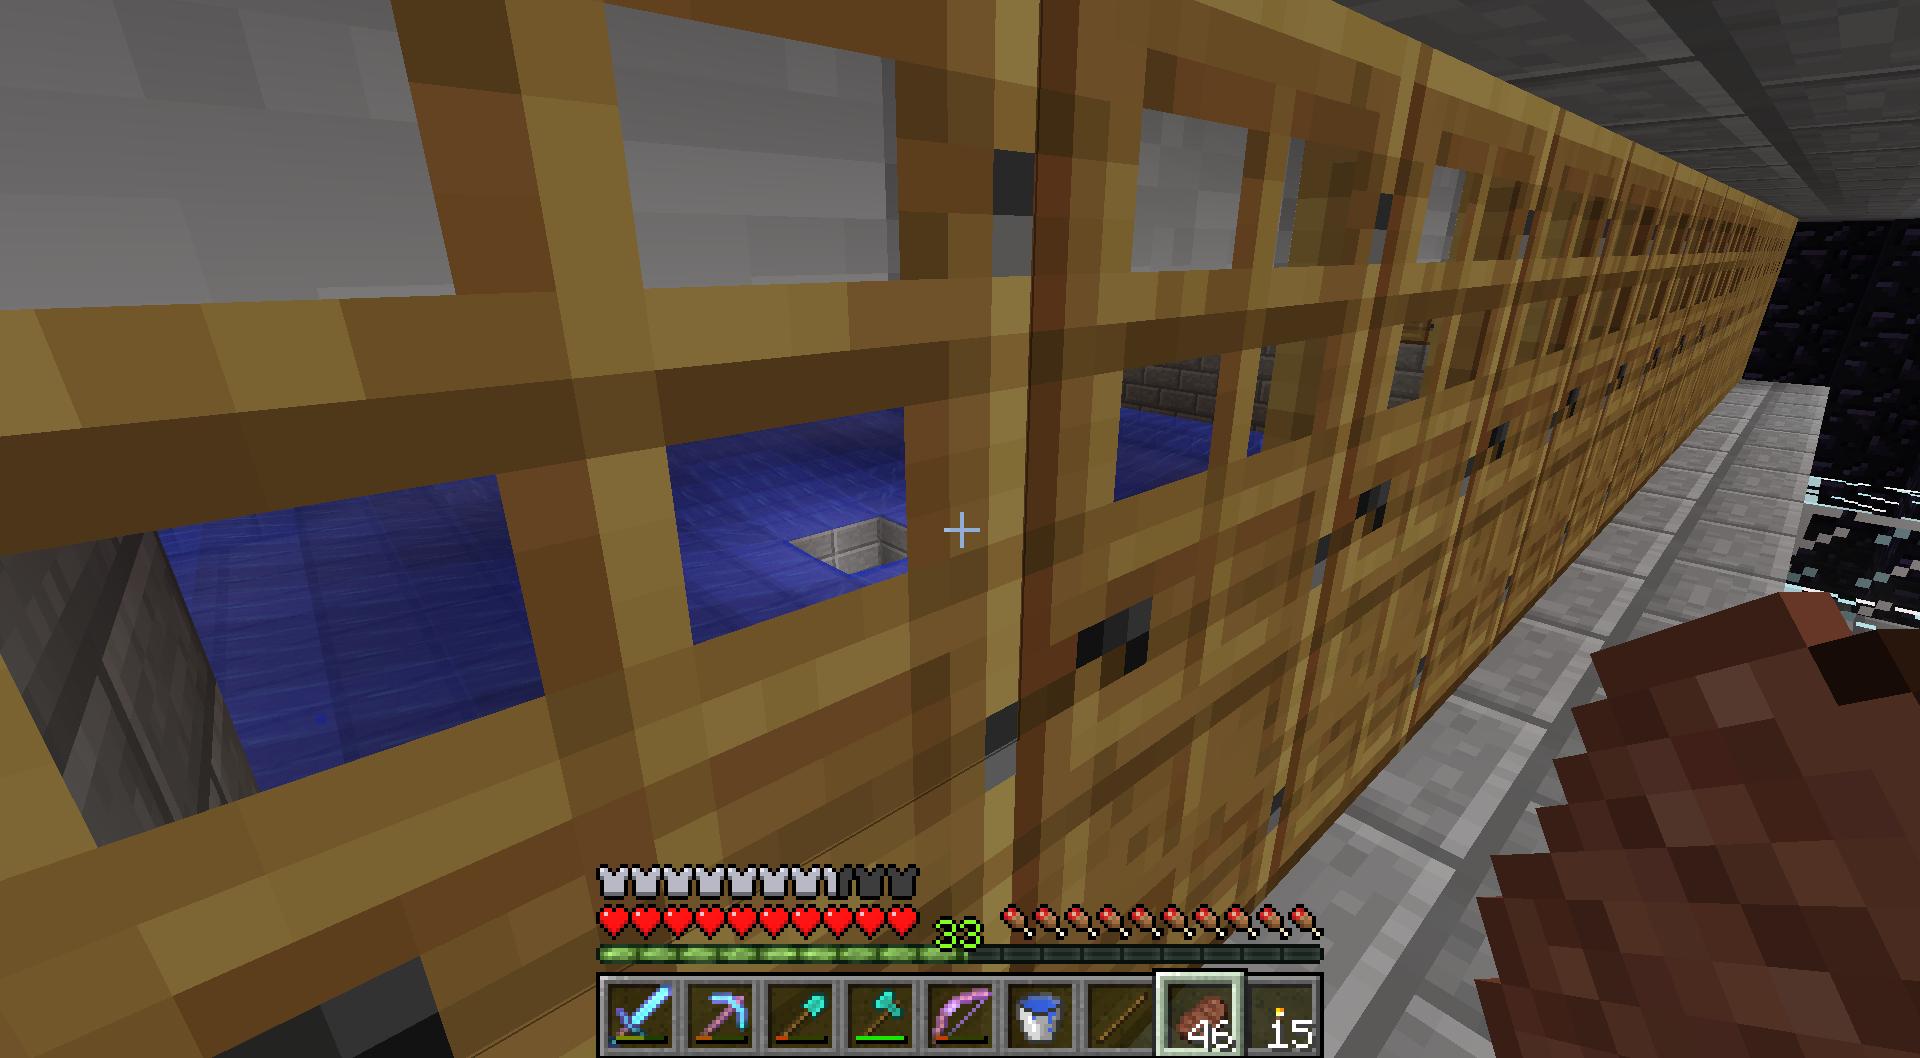 minecraft iron golem spawner farm